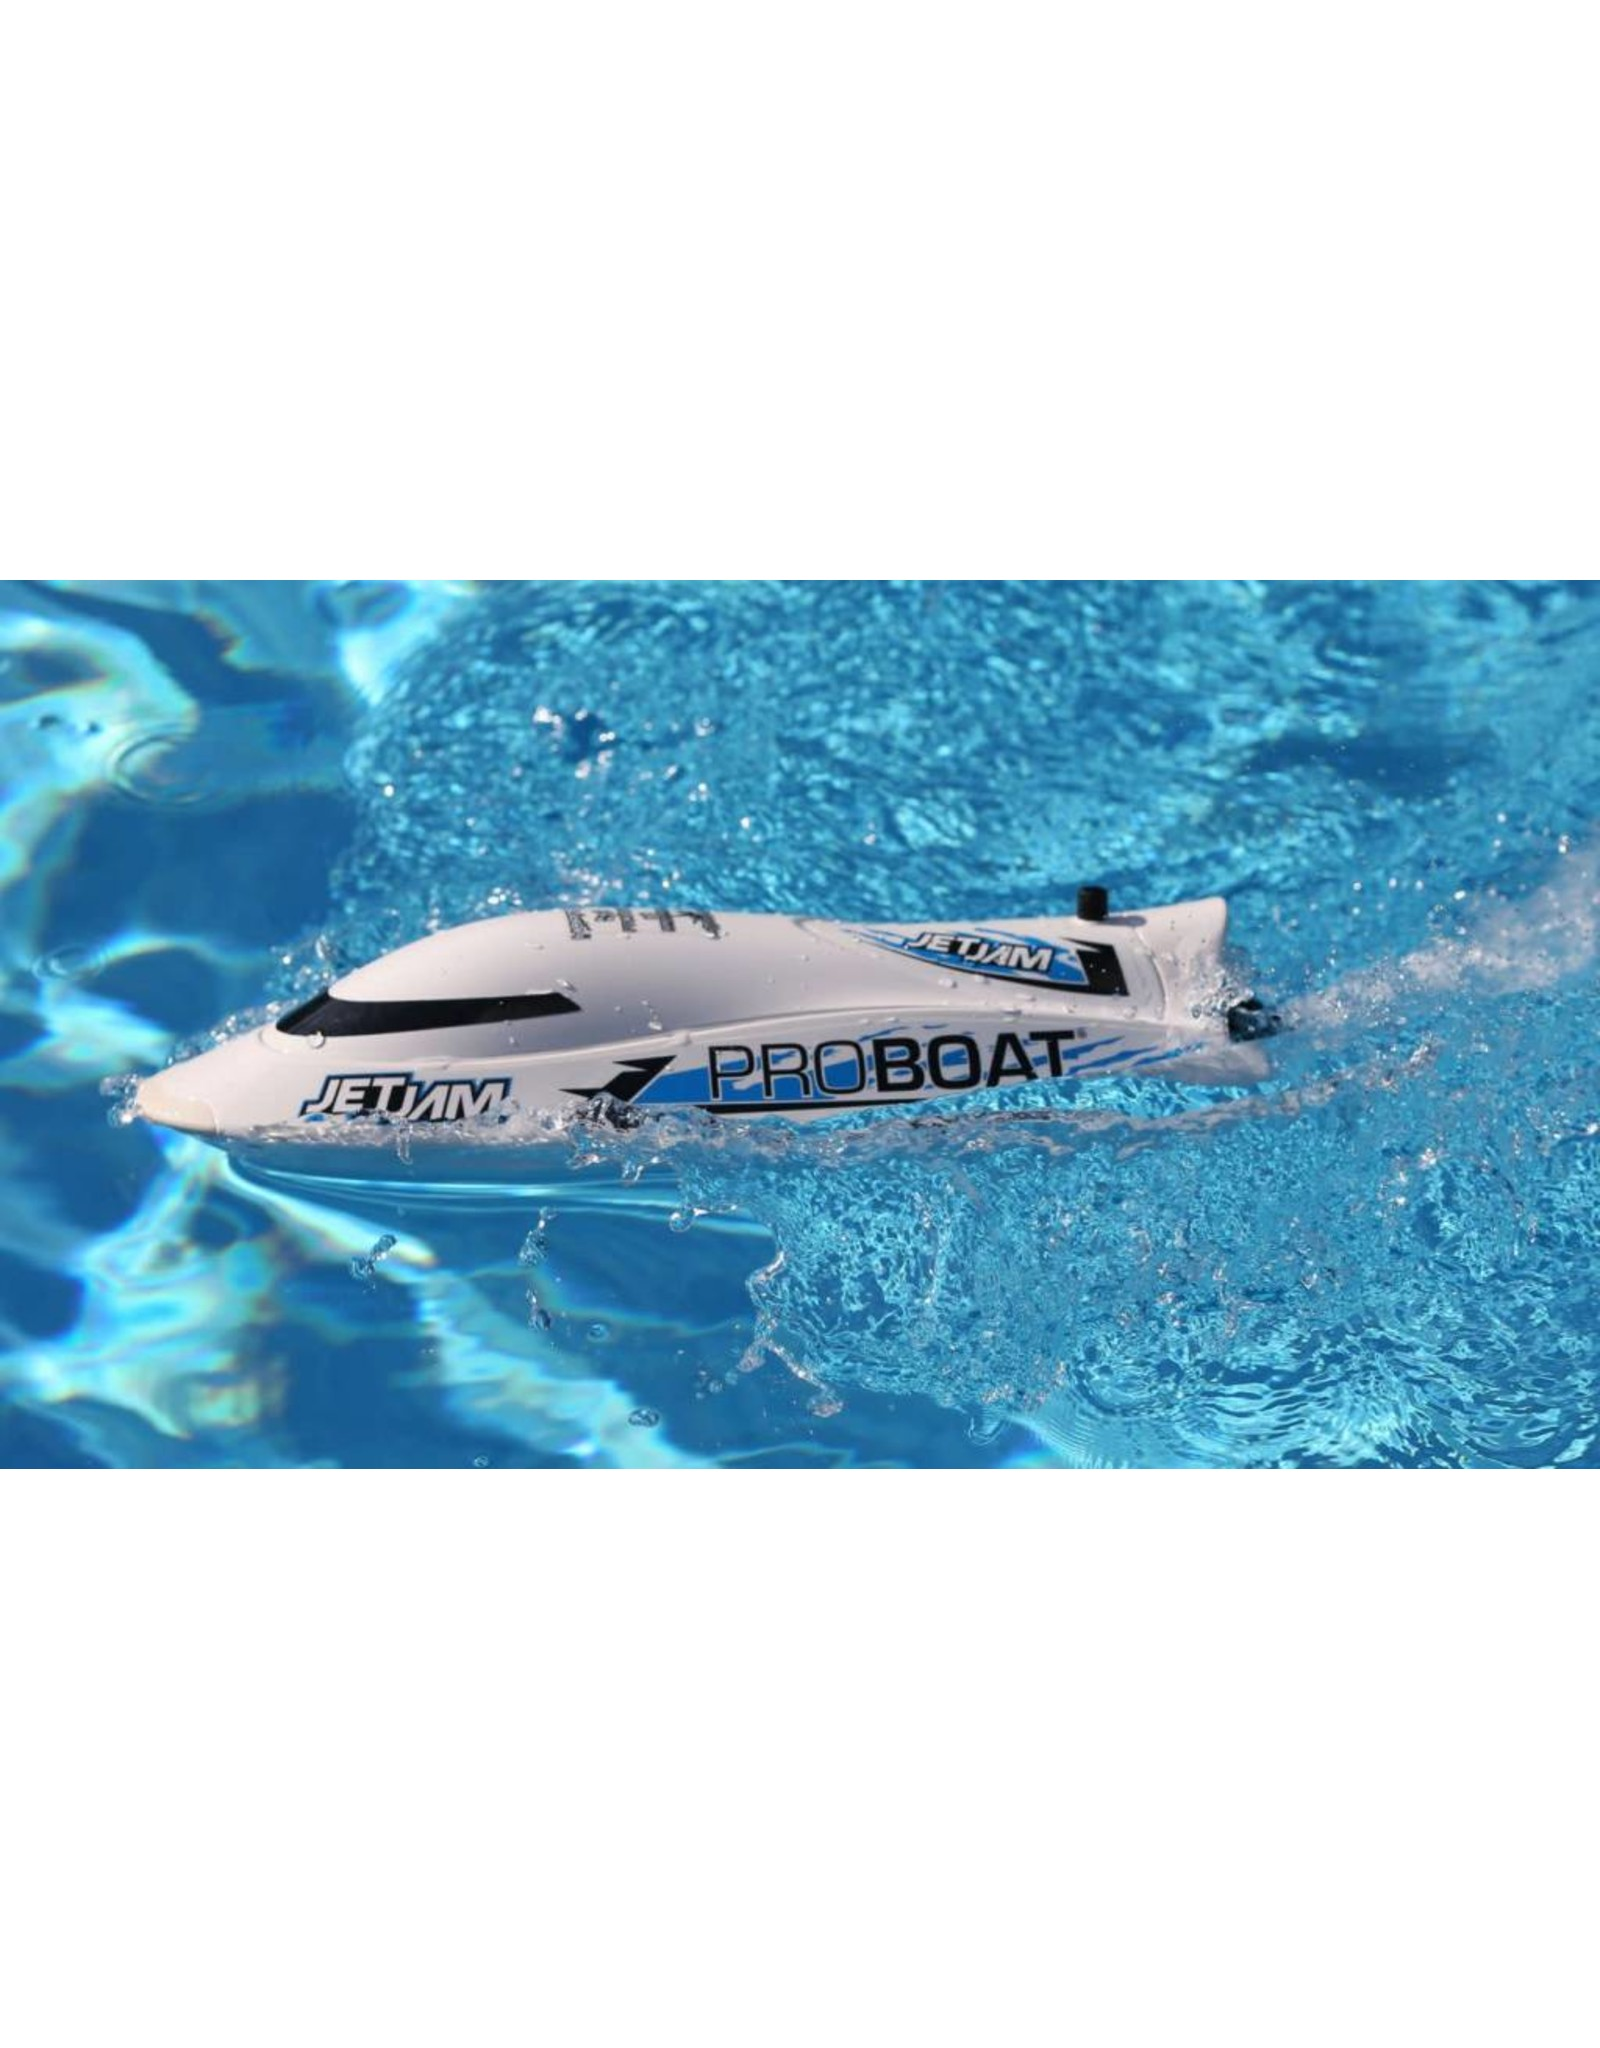 Pro Boat Jet Jam 12-inch Pool Racer, White: RTR